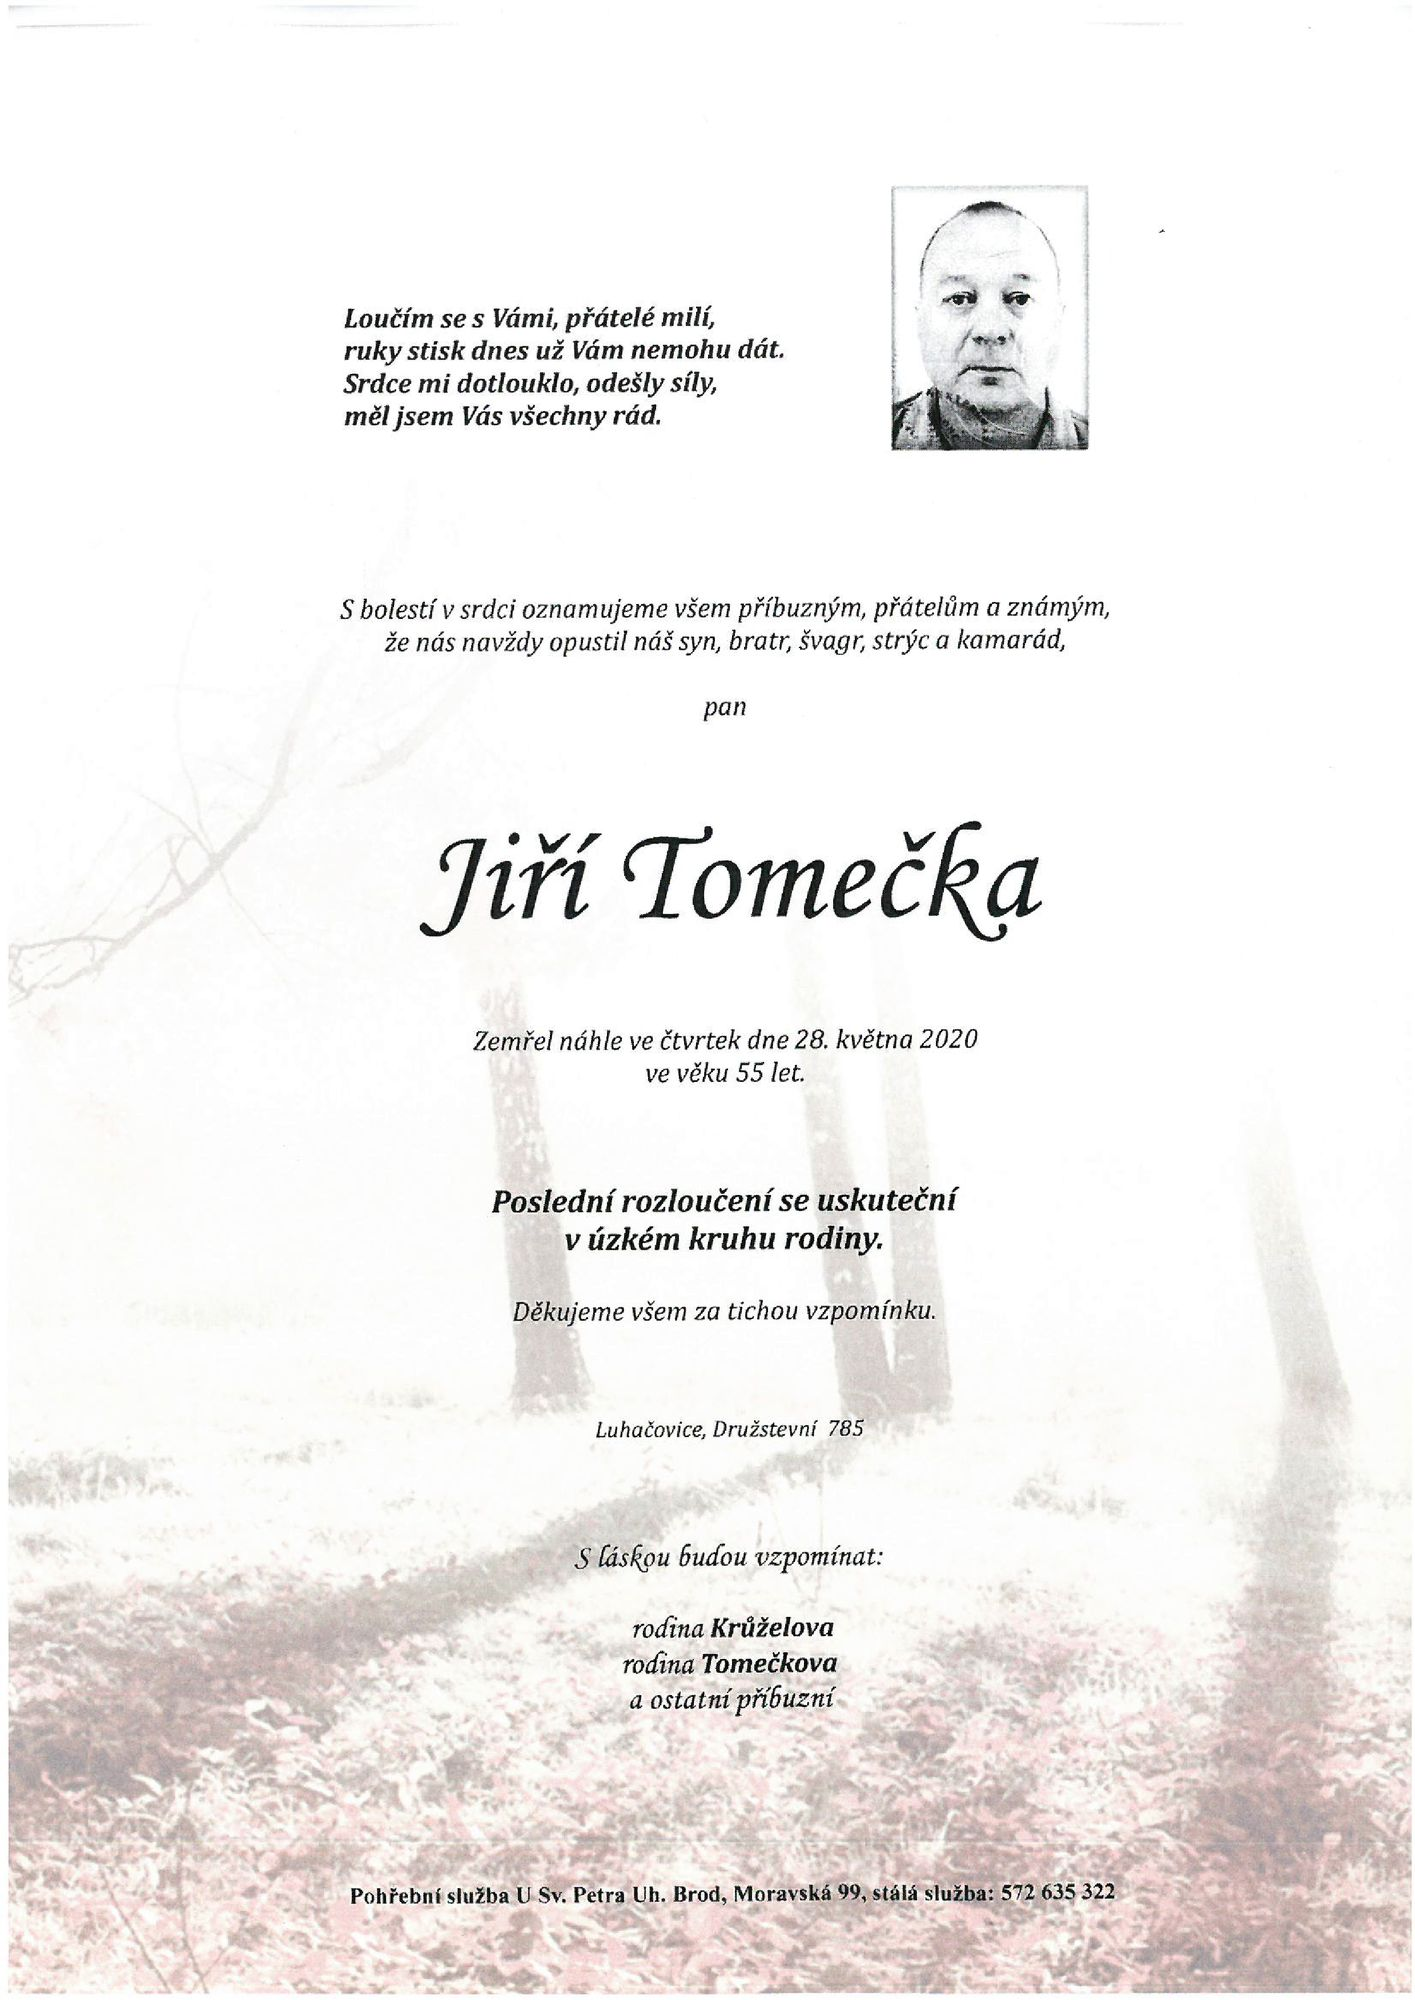 Jiří Tomečka